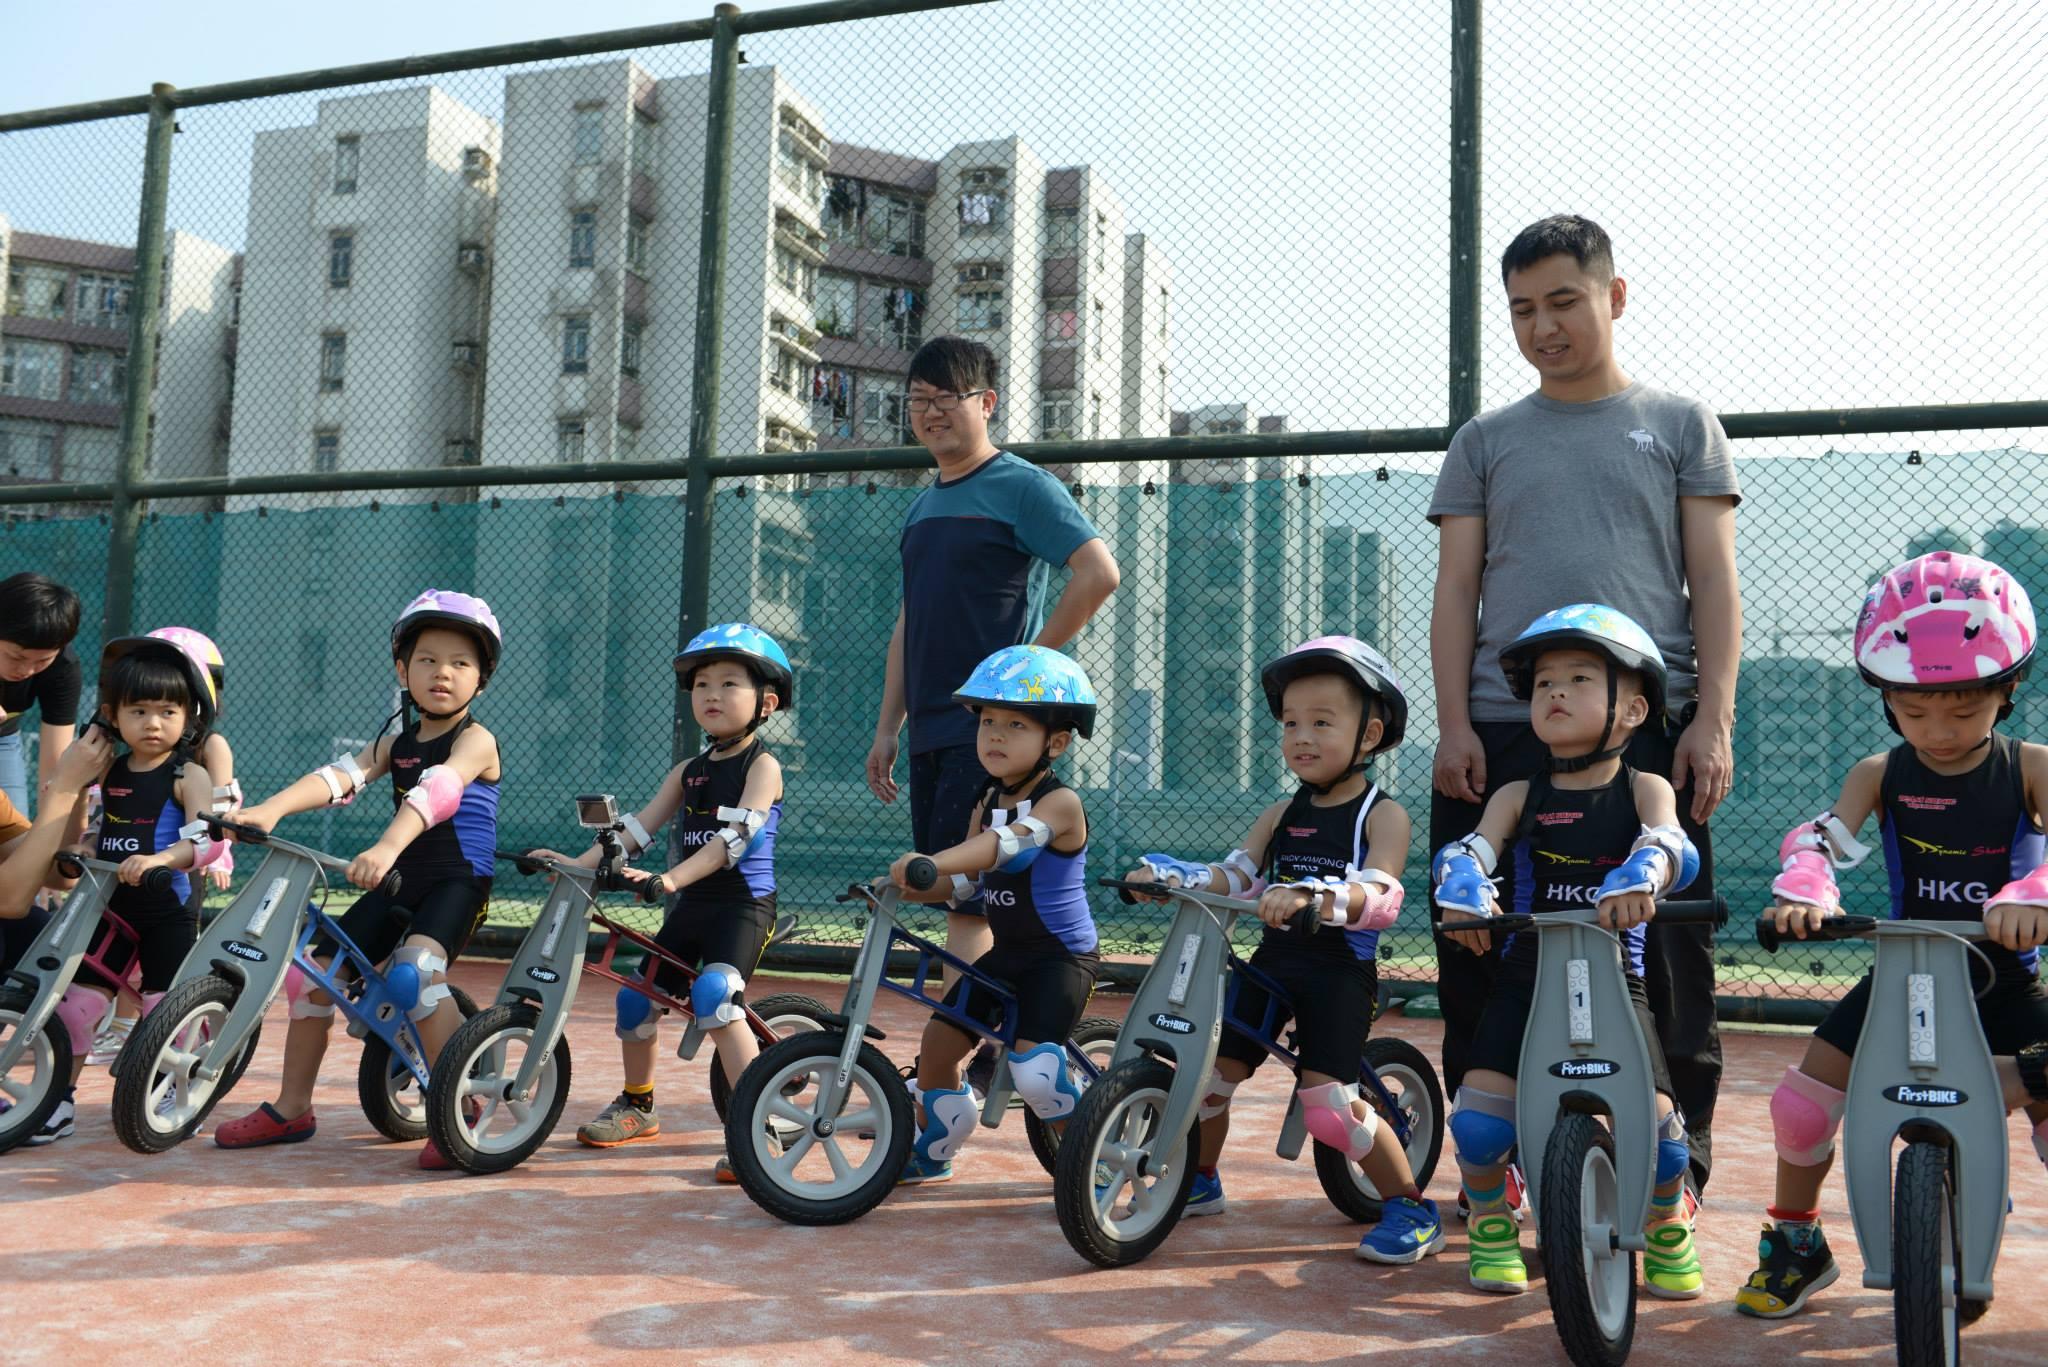 免費兒童平衡車試玩體驗日! - PolyEd Education Centre